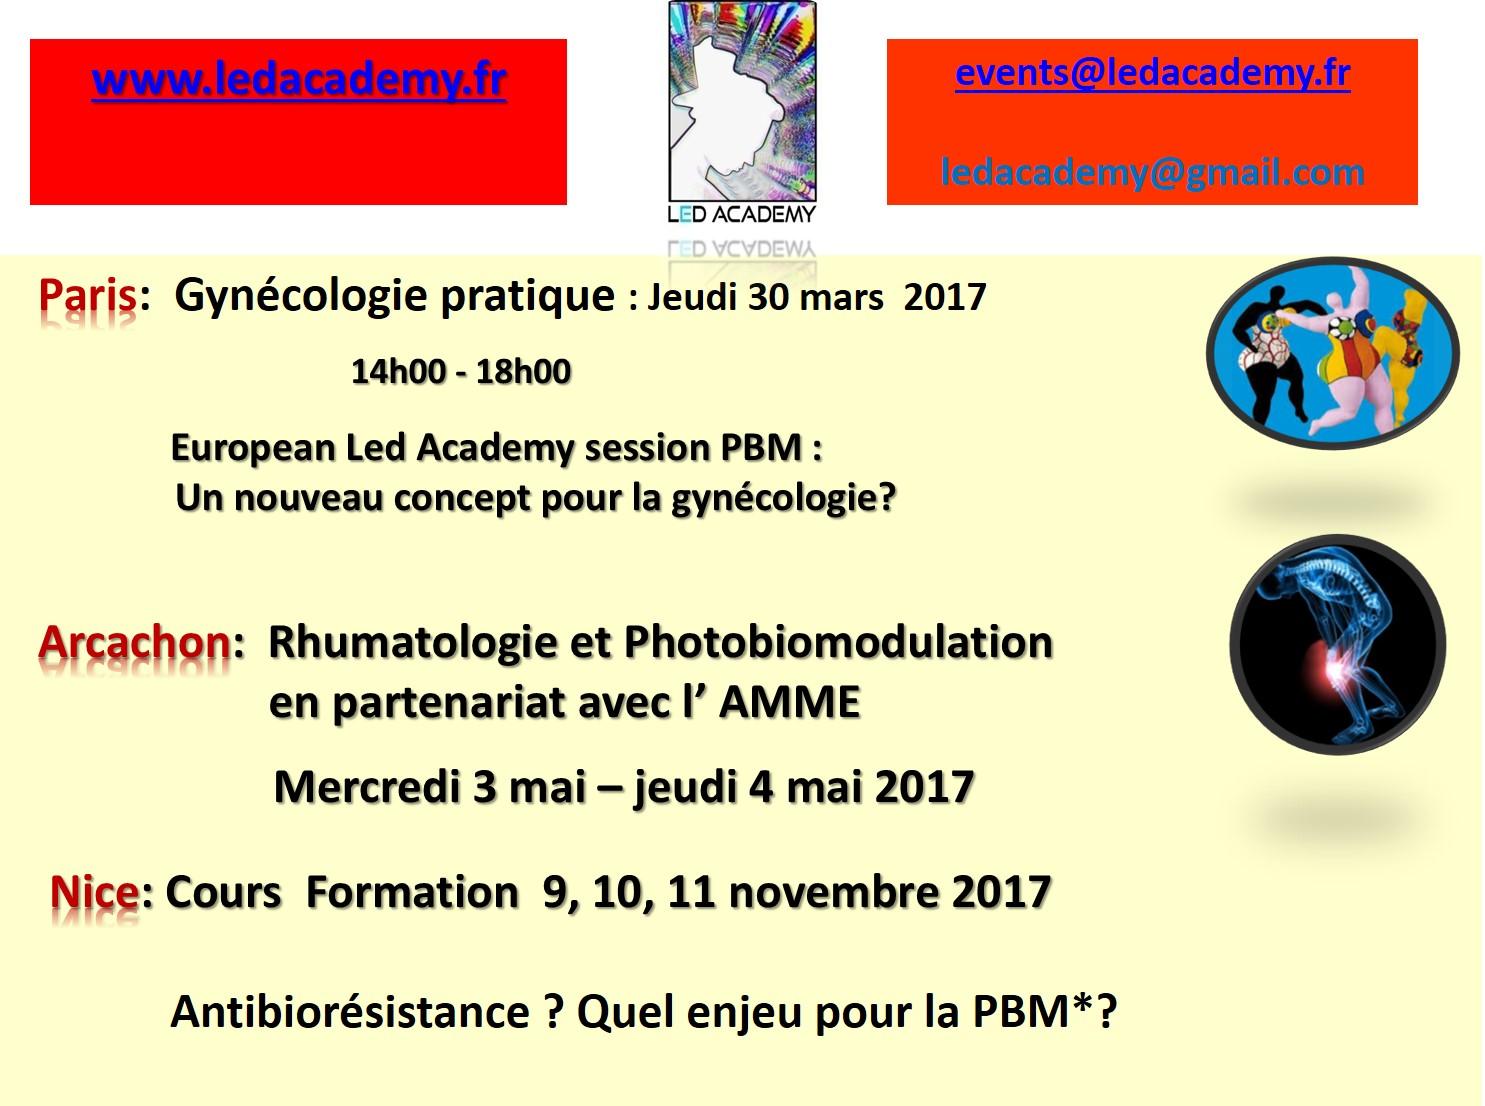 PRG European Led Academy 2017